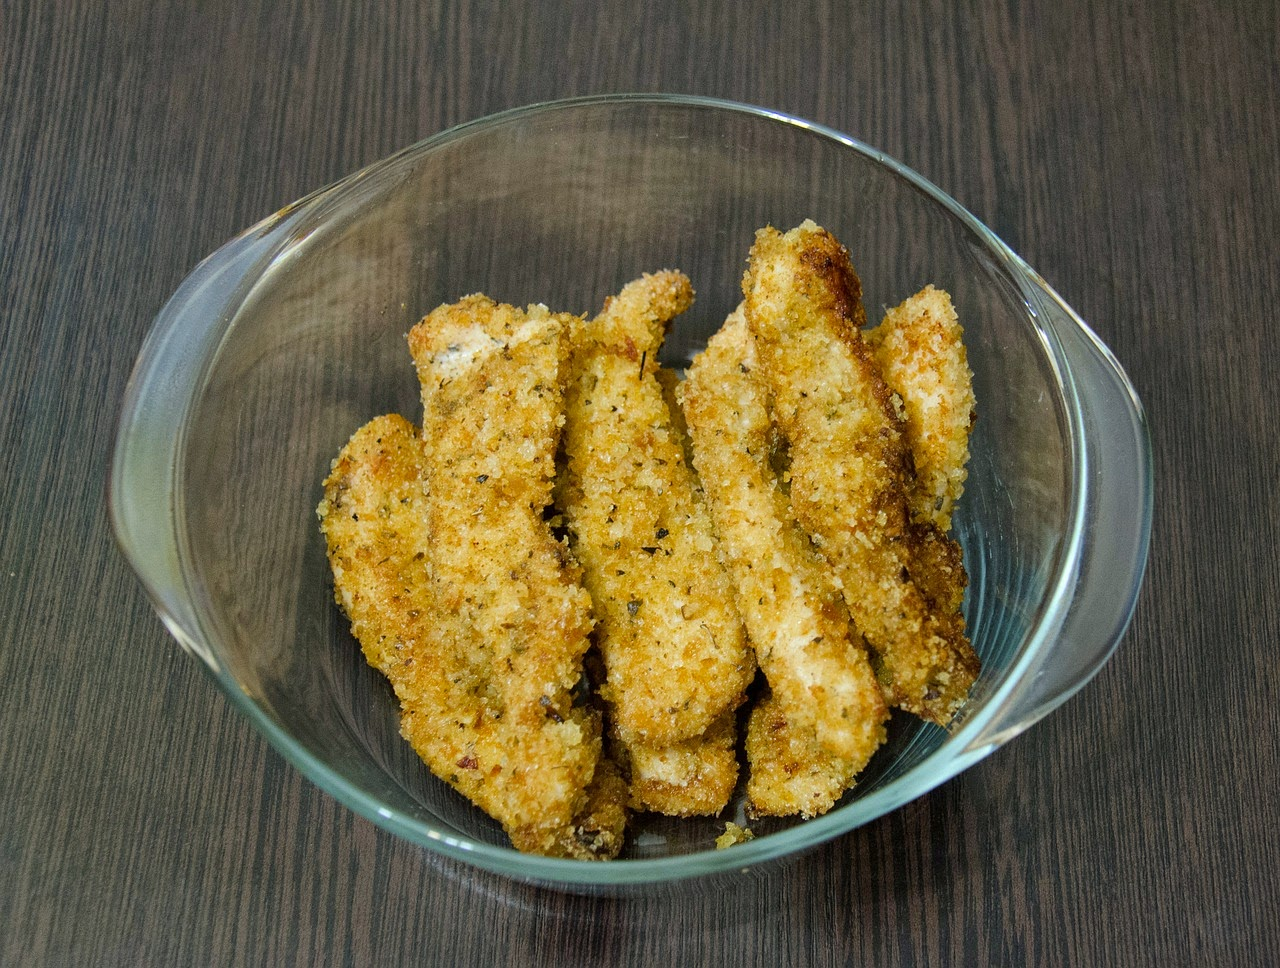 Chicken strips in a bowl